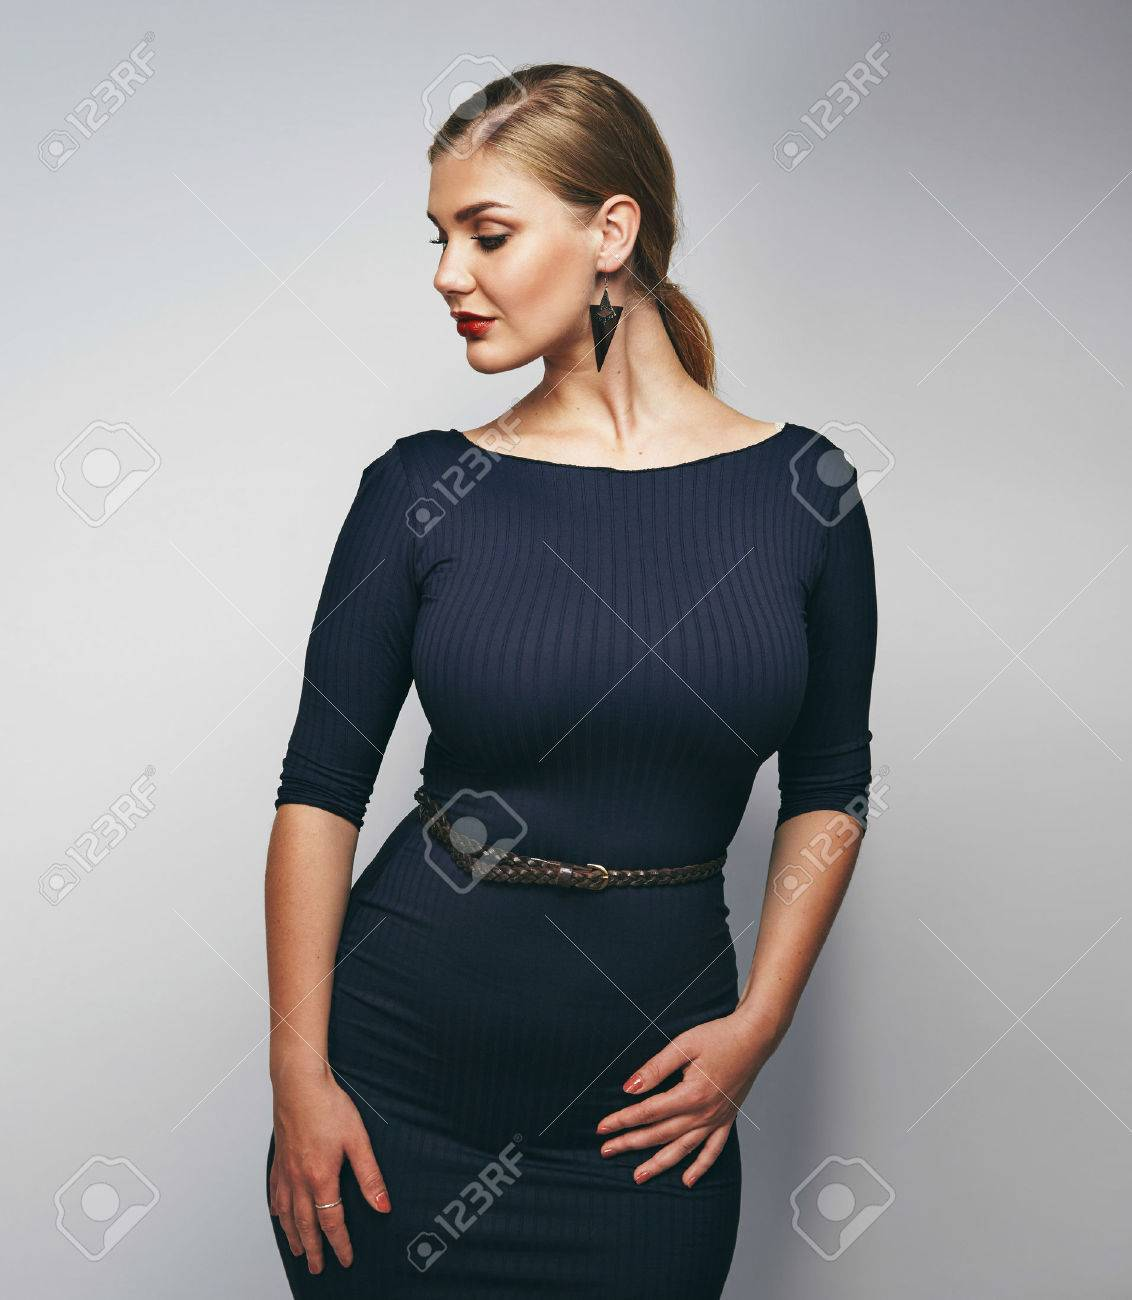 cdb6f9660c7 Portrait of confident female model posing against grey background. Plus size  young caucasian woman.